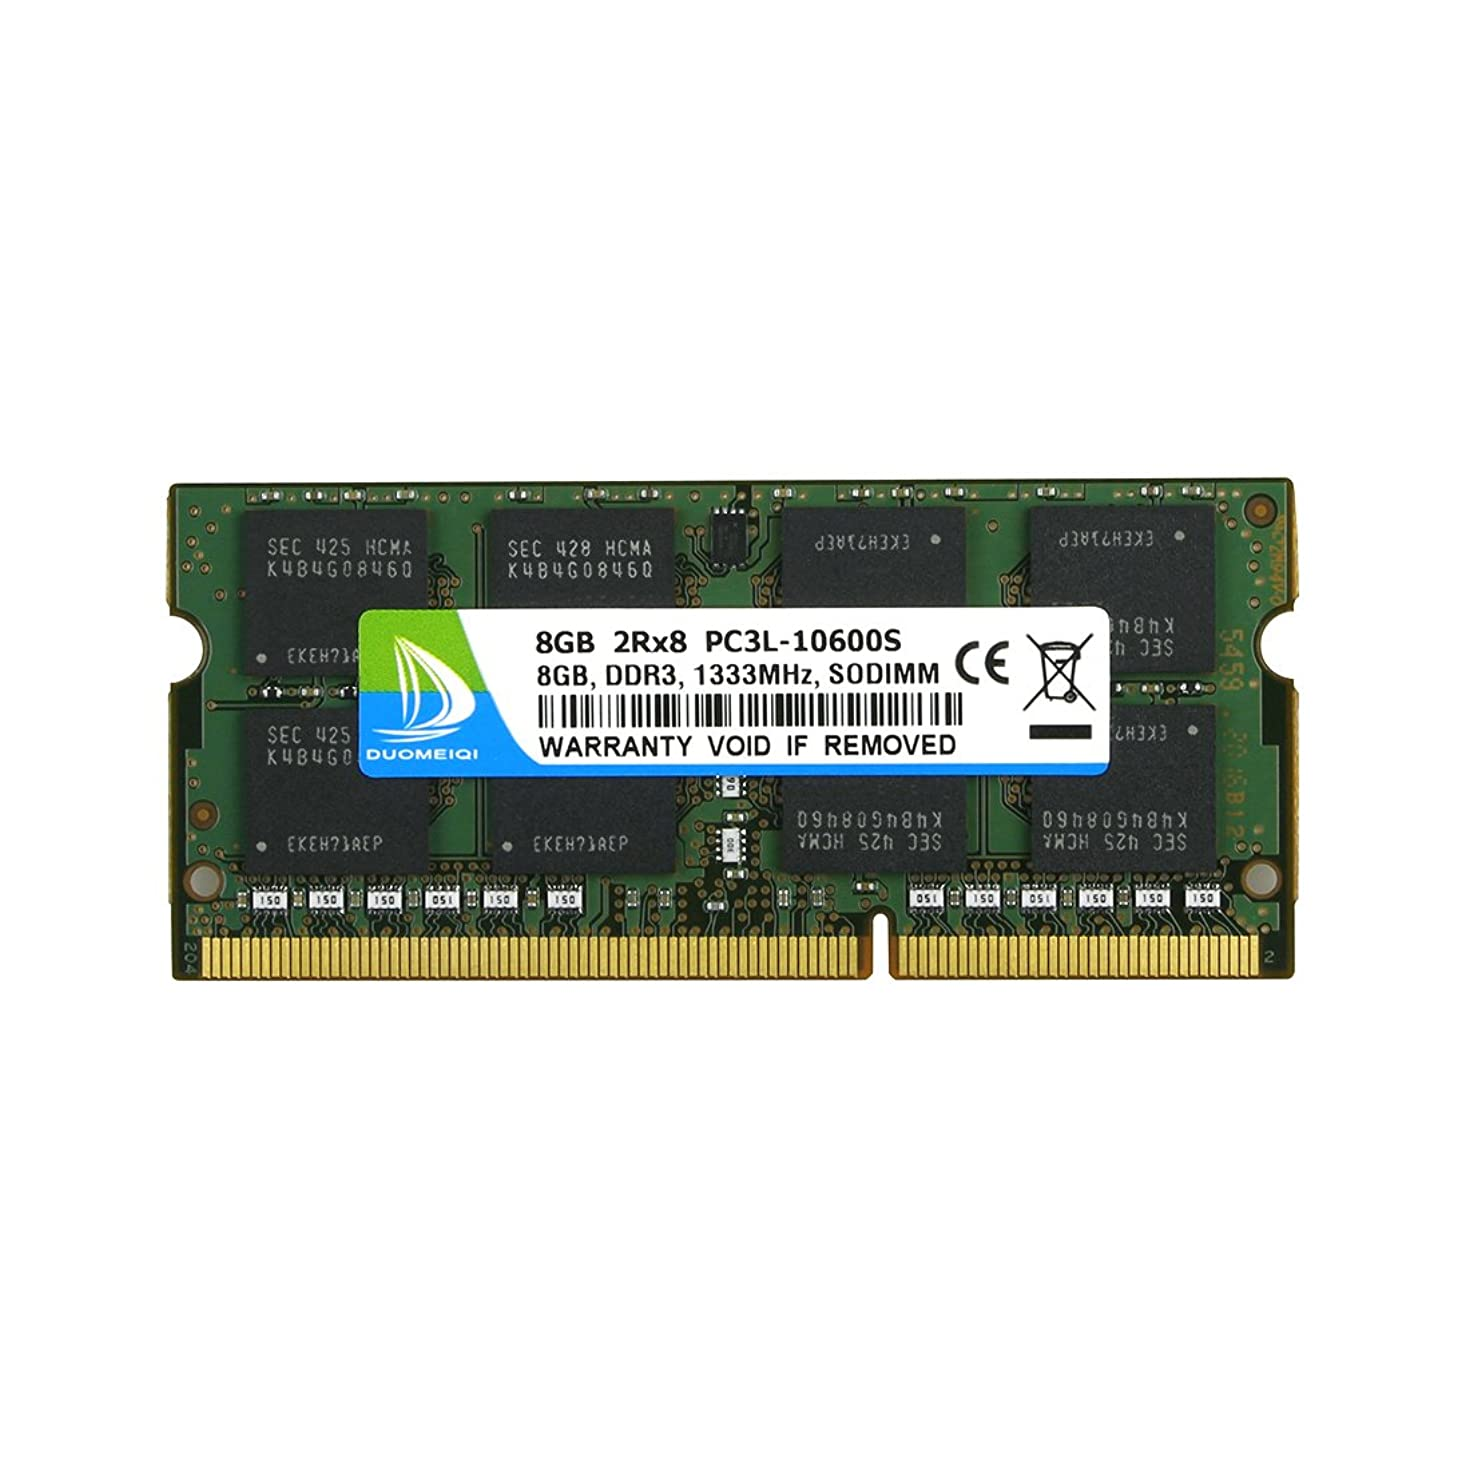 DUOMEIQI DDR3 1333, PC3-10600 DDR3 Ram 8GB 2Rx8 PC3 10600S 8GB DDR3 204 pin 1.35v CL9 PC3/PC3L DDR3/DDR3L Notebook Laptop Memory RAM Module